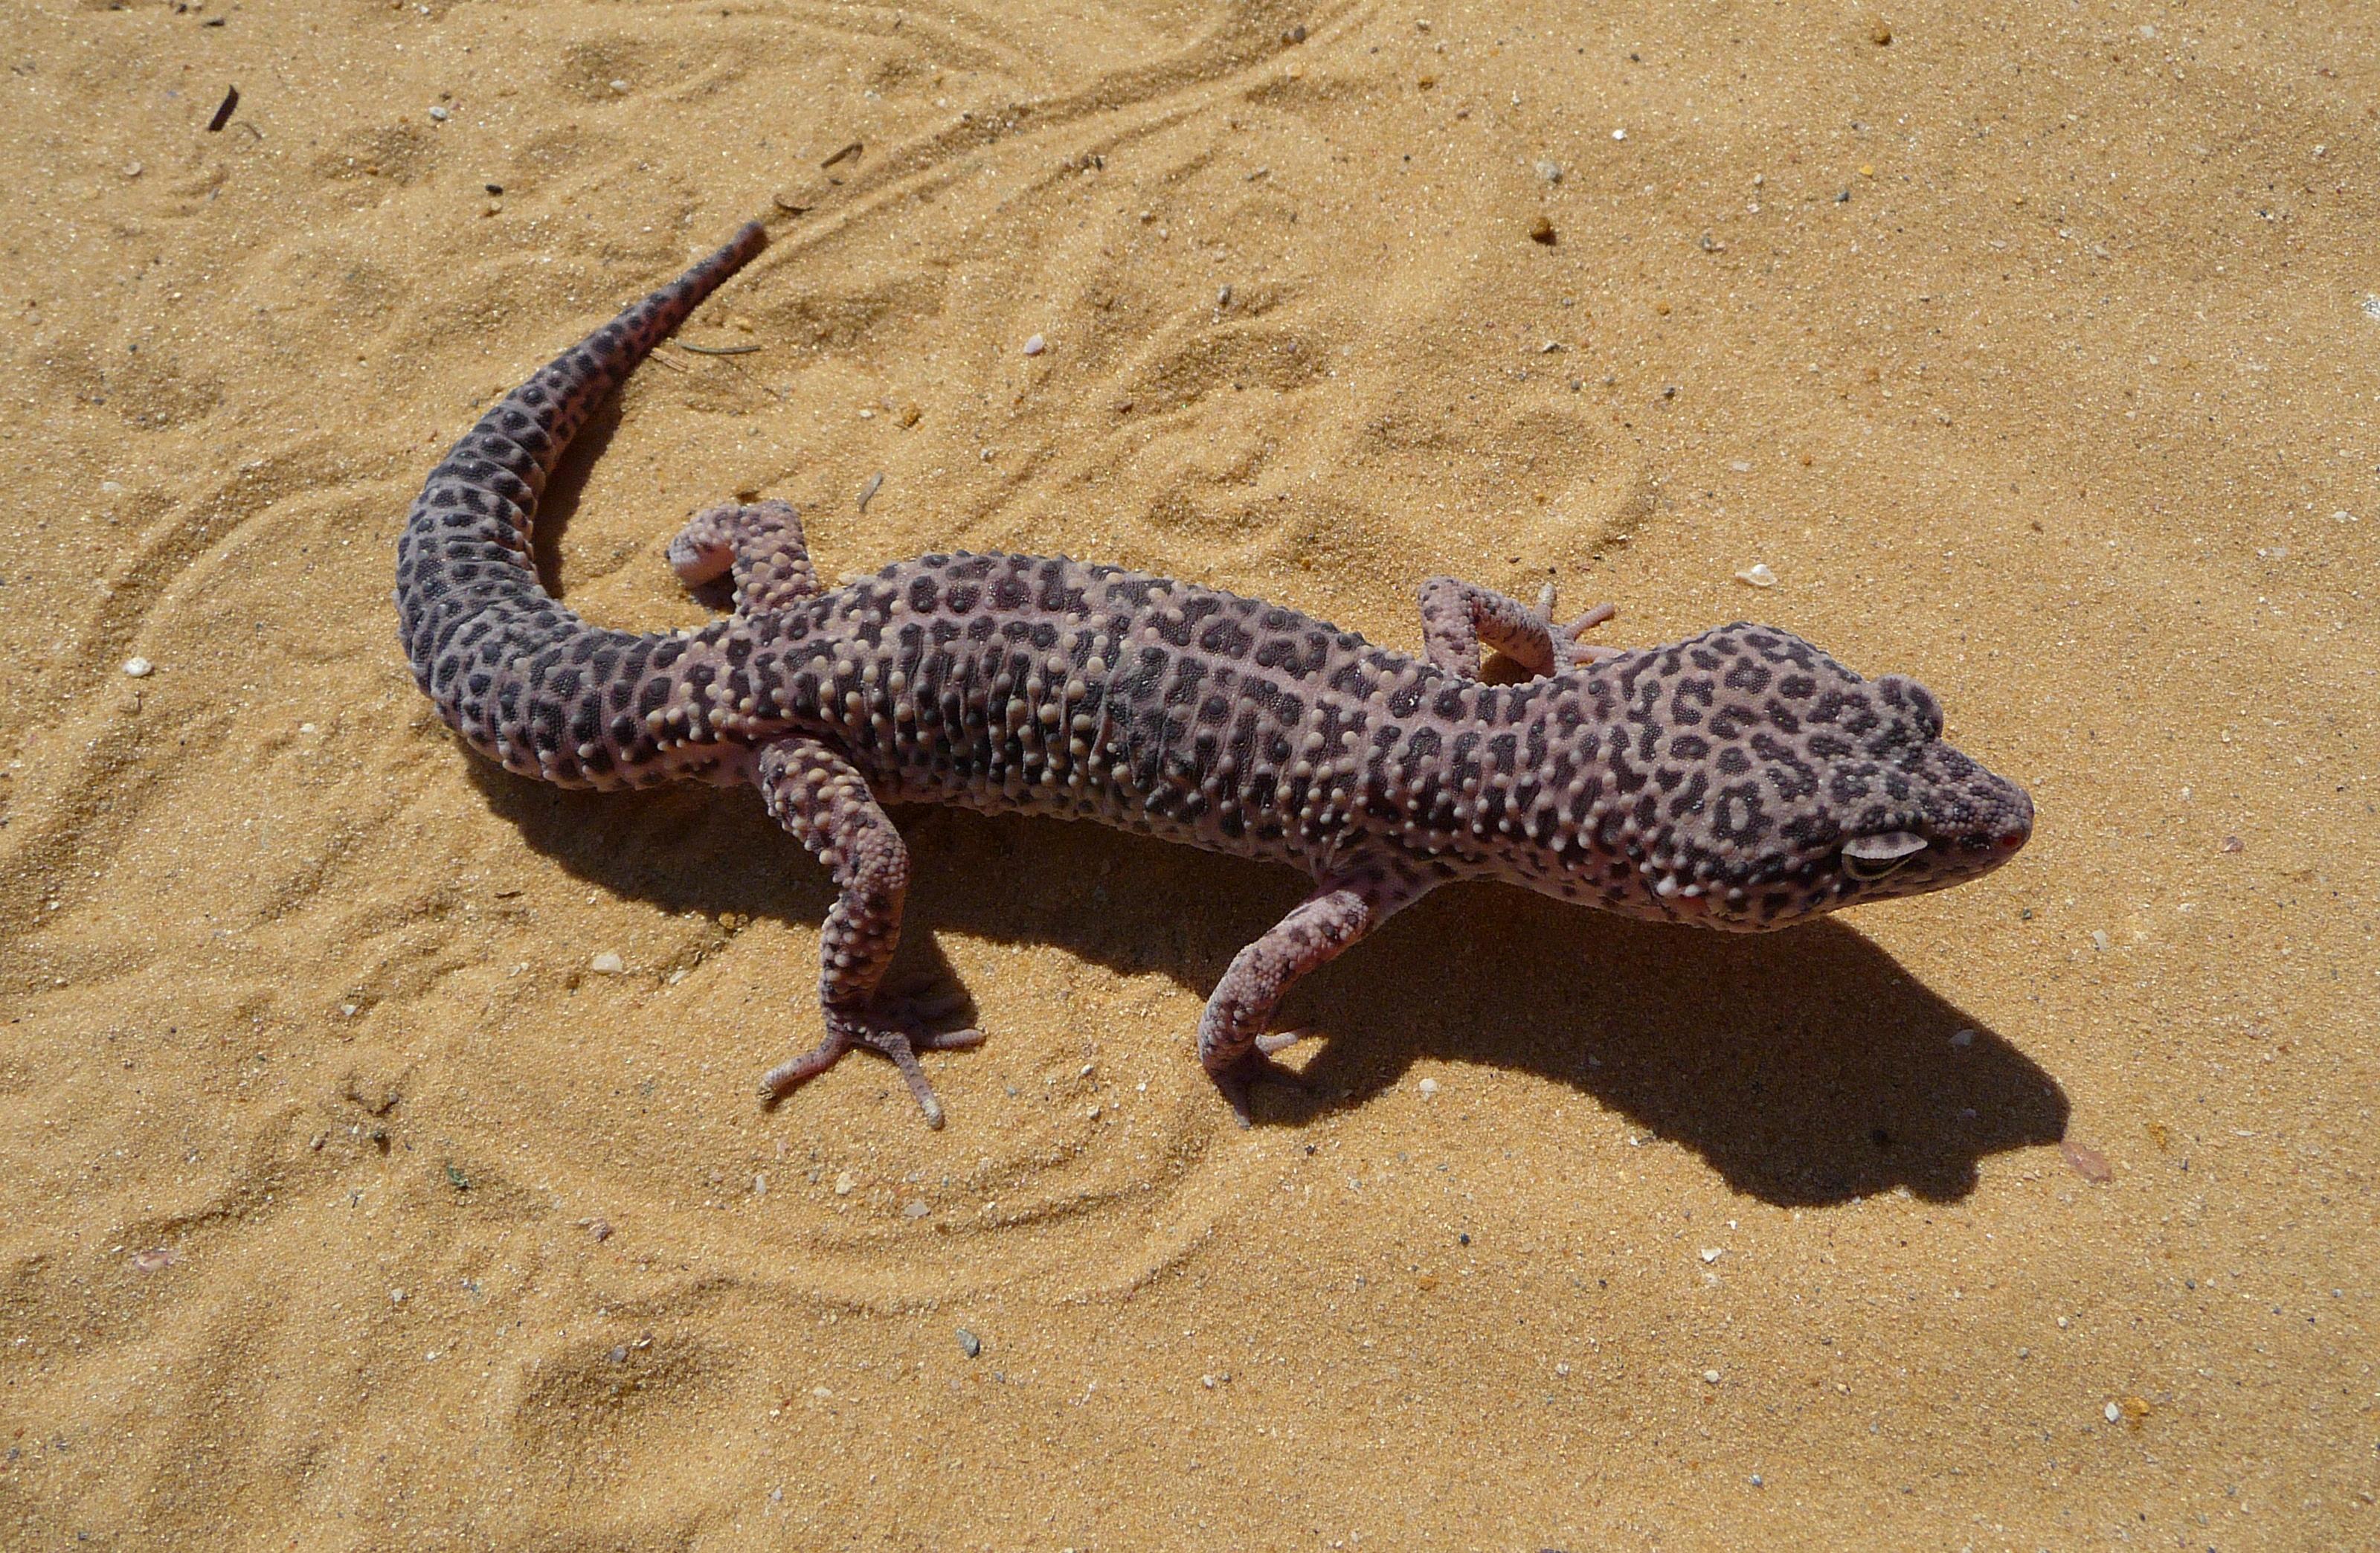 File:Juvenile-leopard-gecko-2.jpg - Wikimedia Commons